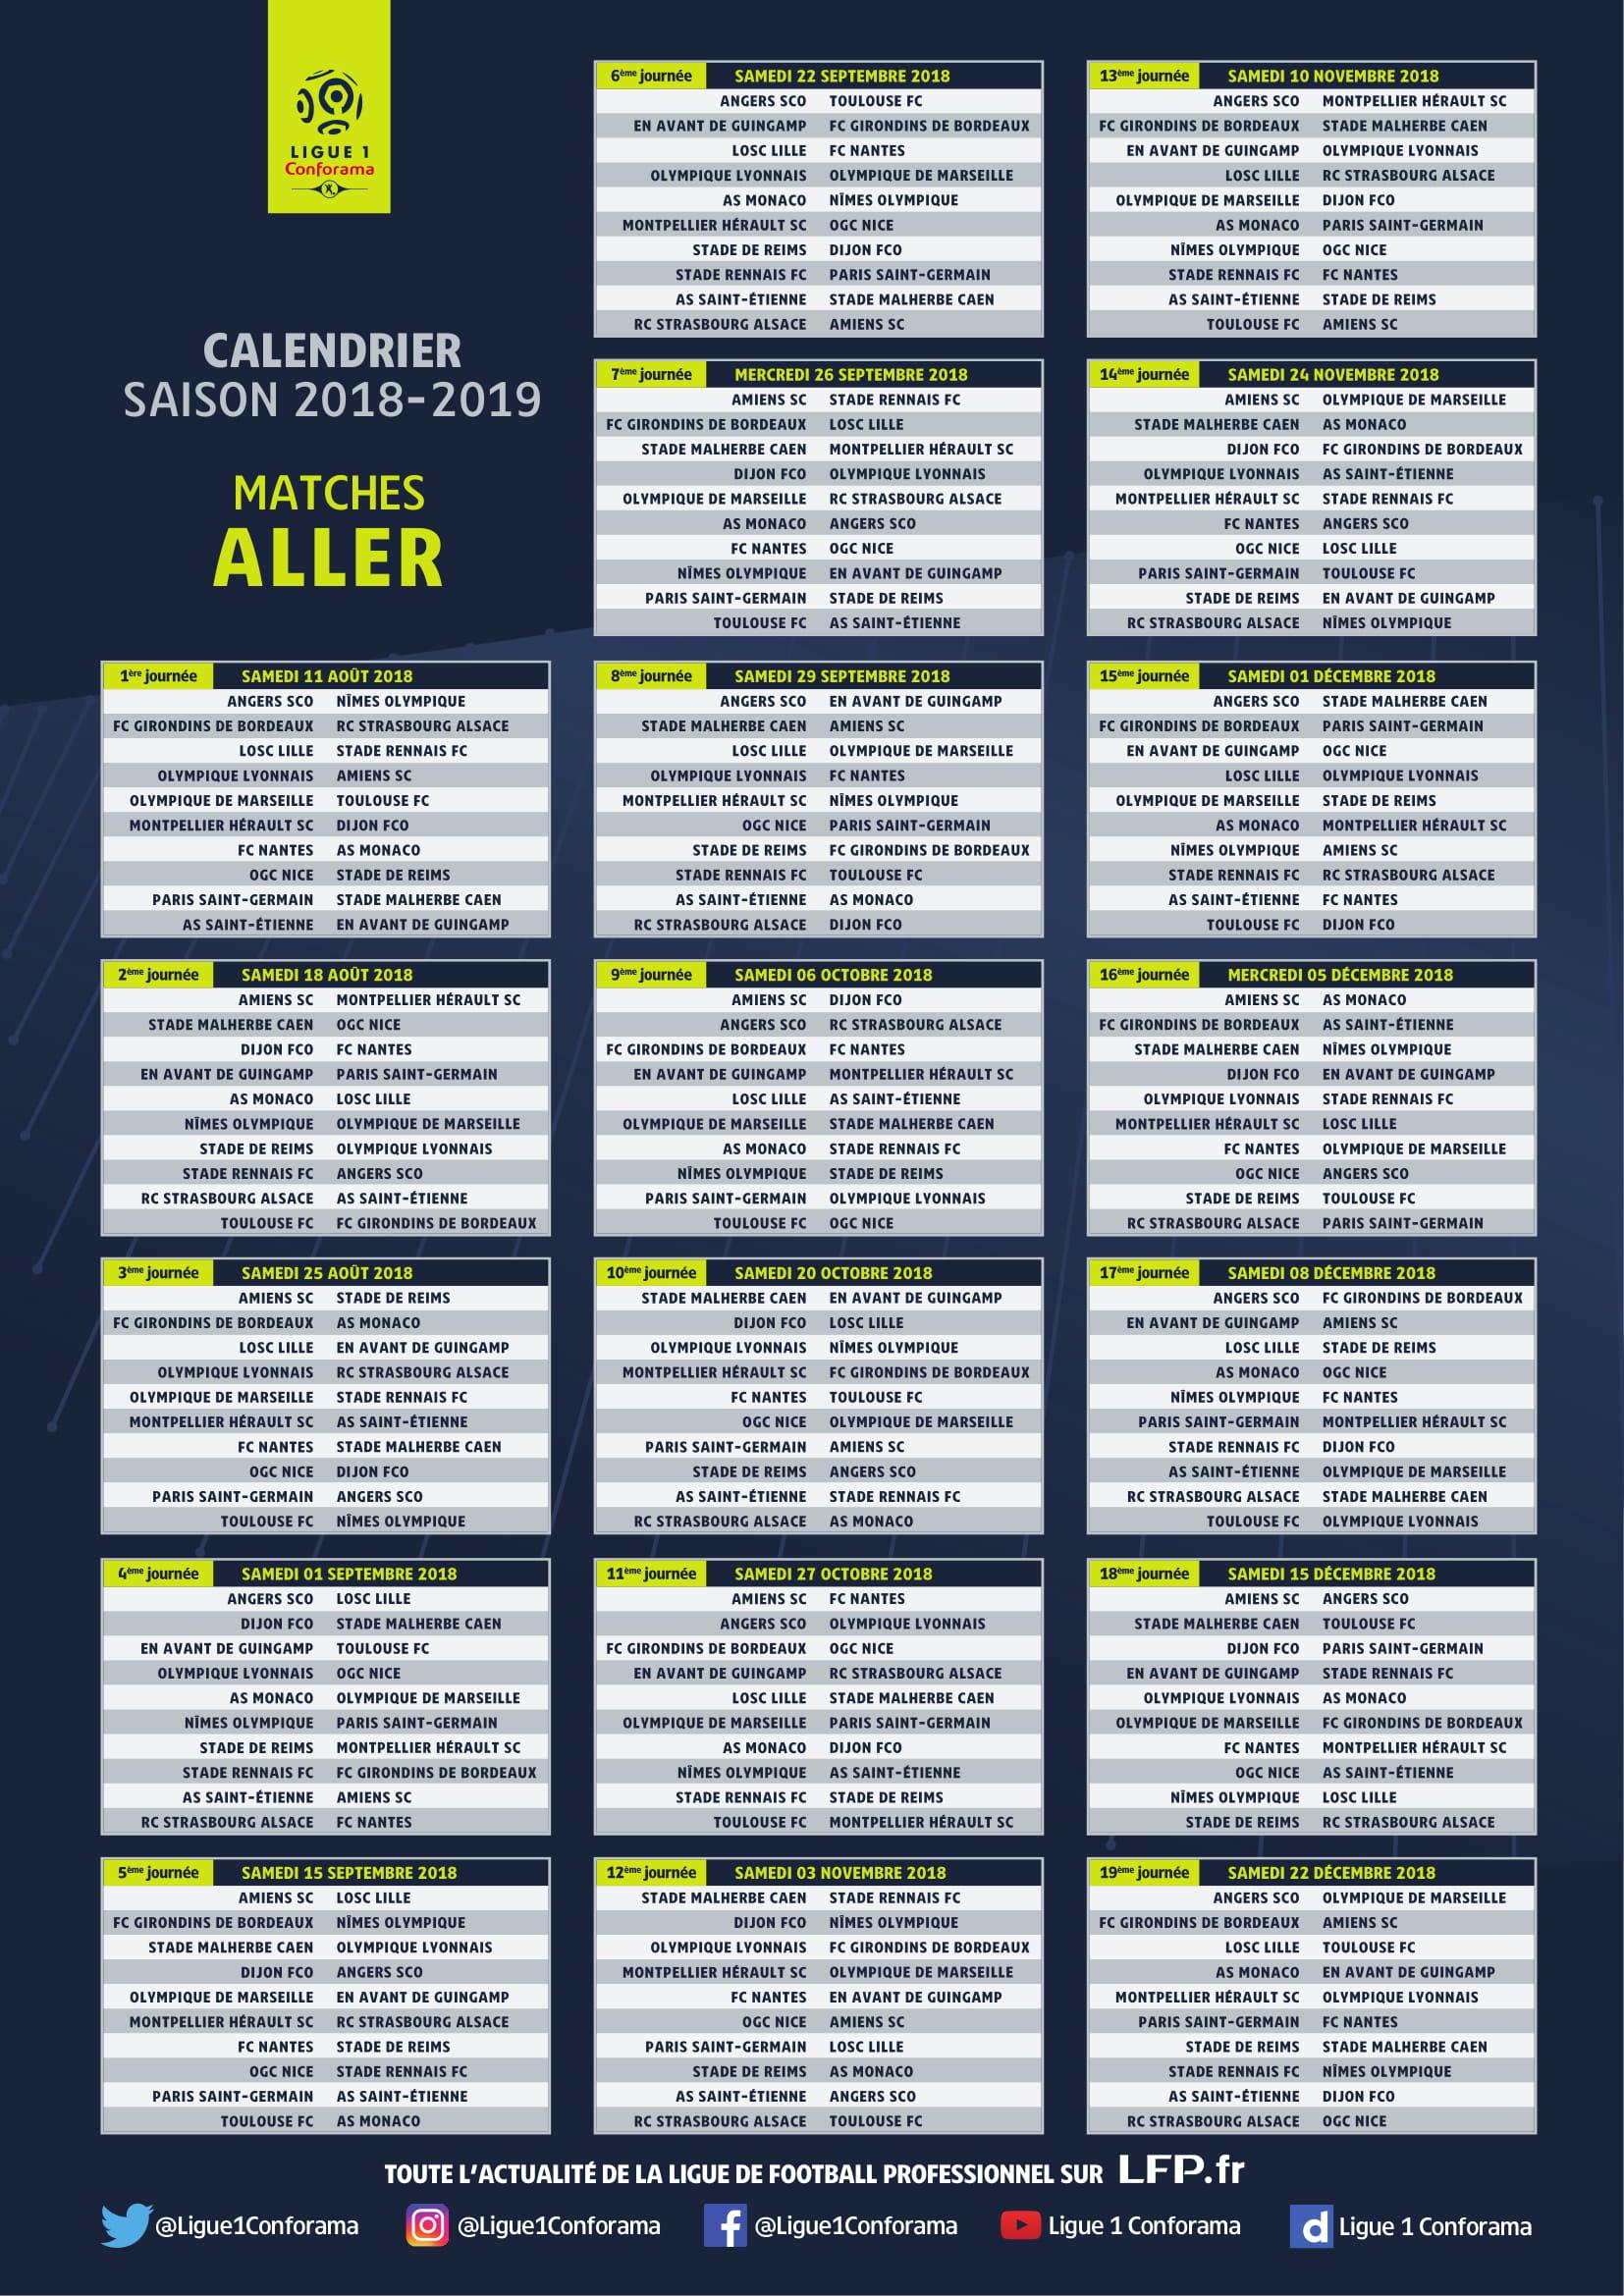 Calendrier L1 Psg.Le Calendrier 2018 2019 De La Ligue 1 Conforama Devoile